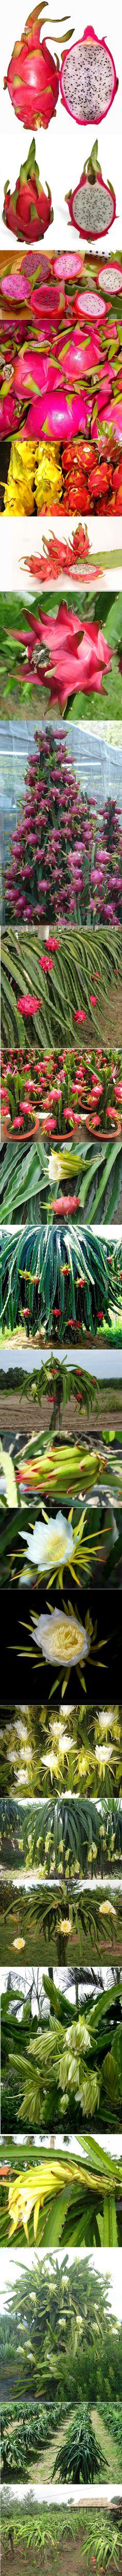 Dragon fruit. Hylocereus undatus. Red pitaya